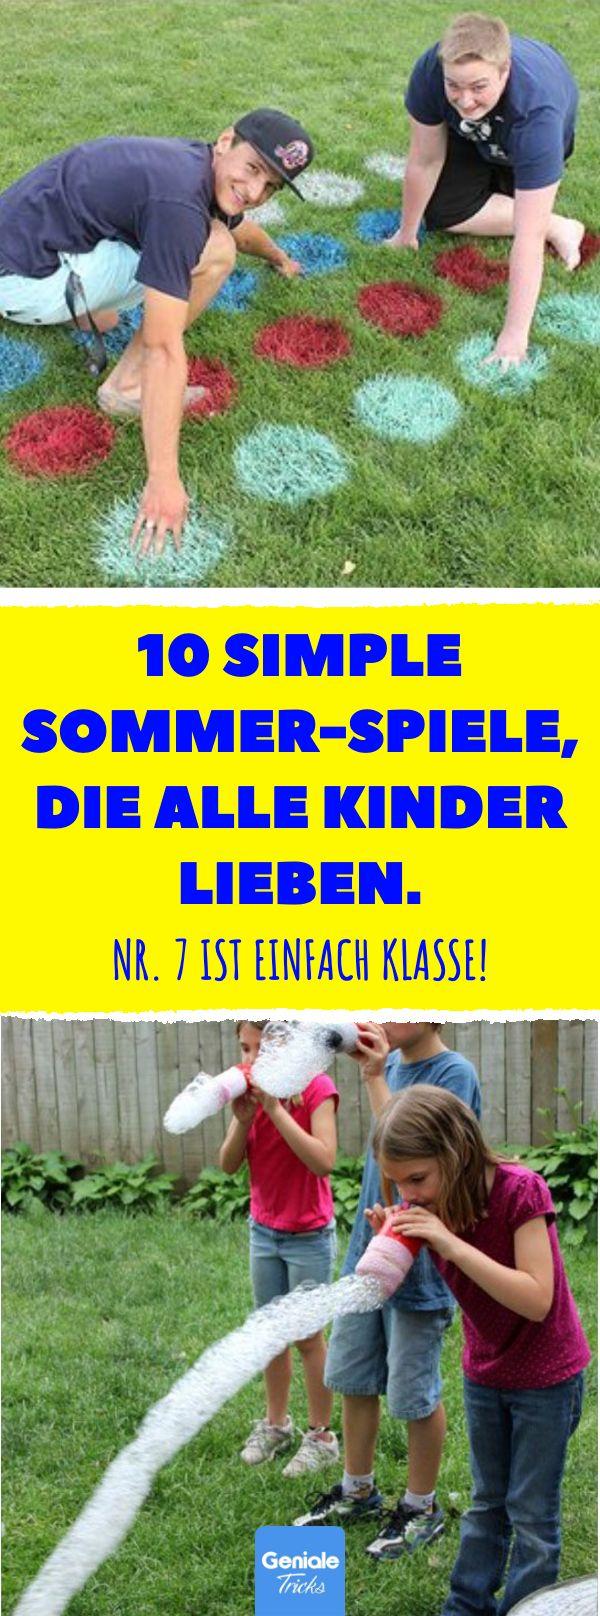 10 simple Sommer-Spiele, die alle Kinder lieben. Nr. 7 ist einfach klasse! Kreat… – Geniale Tricks